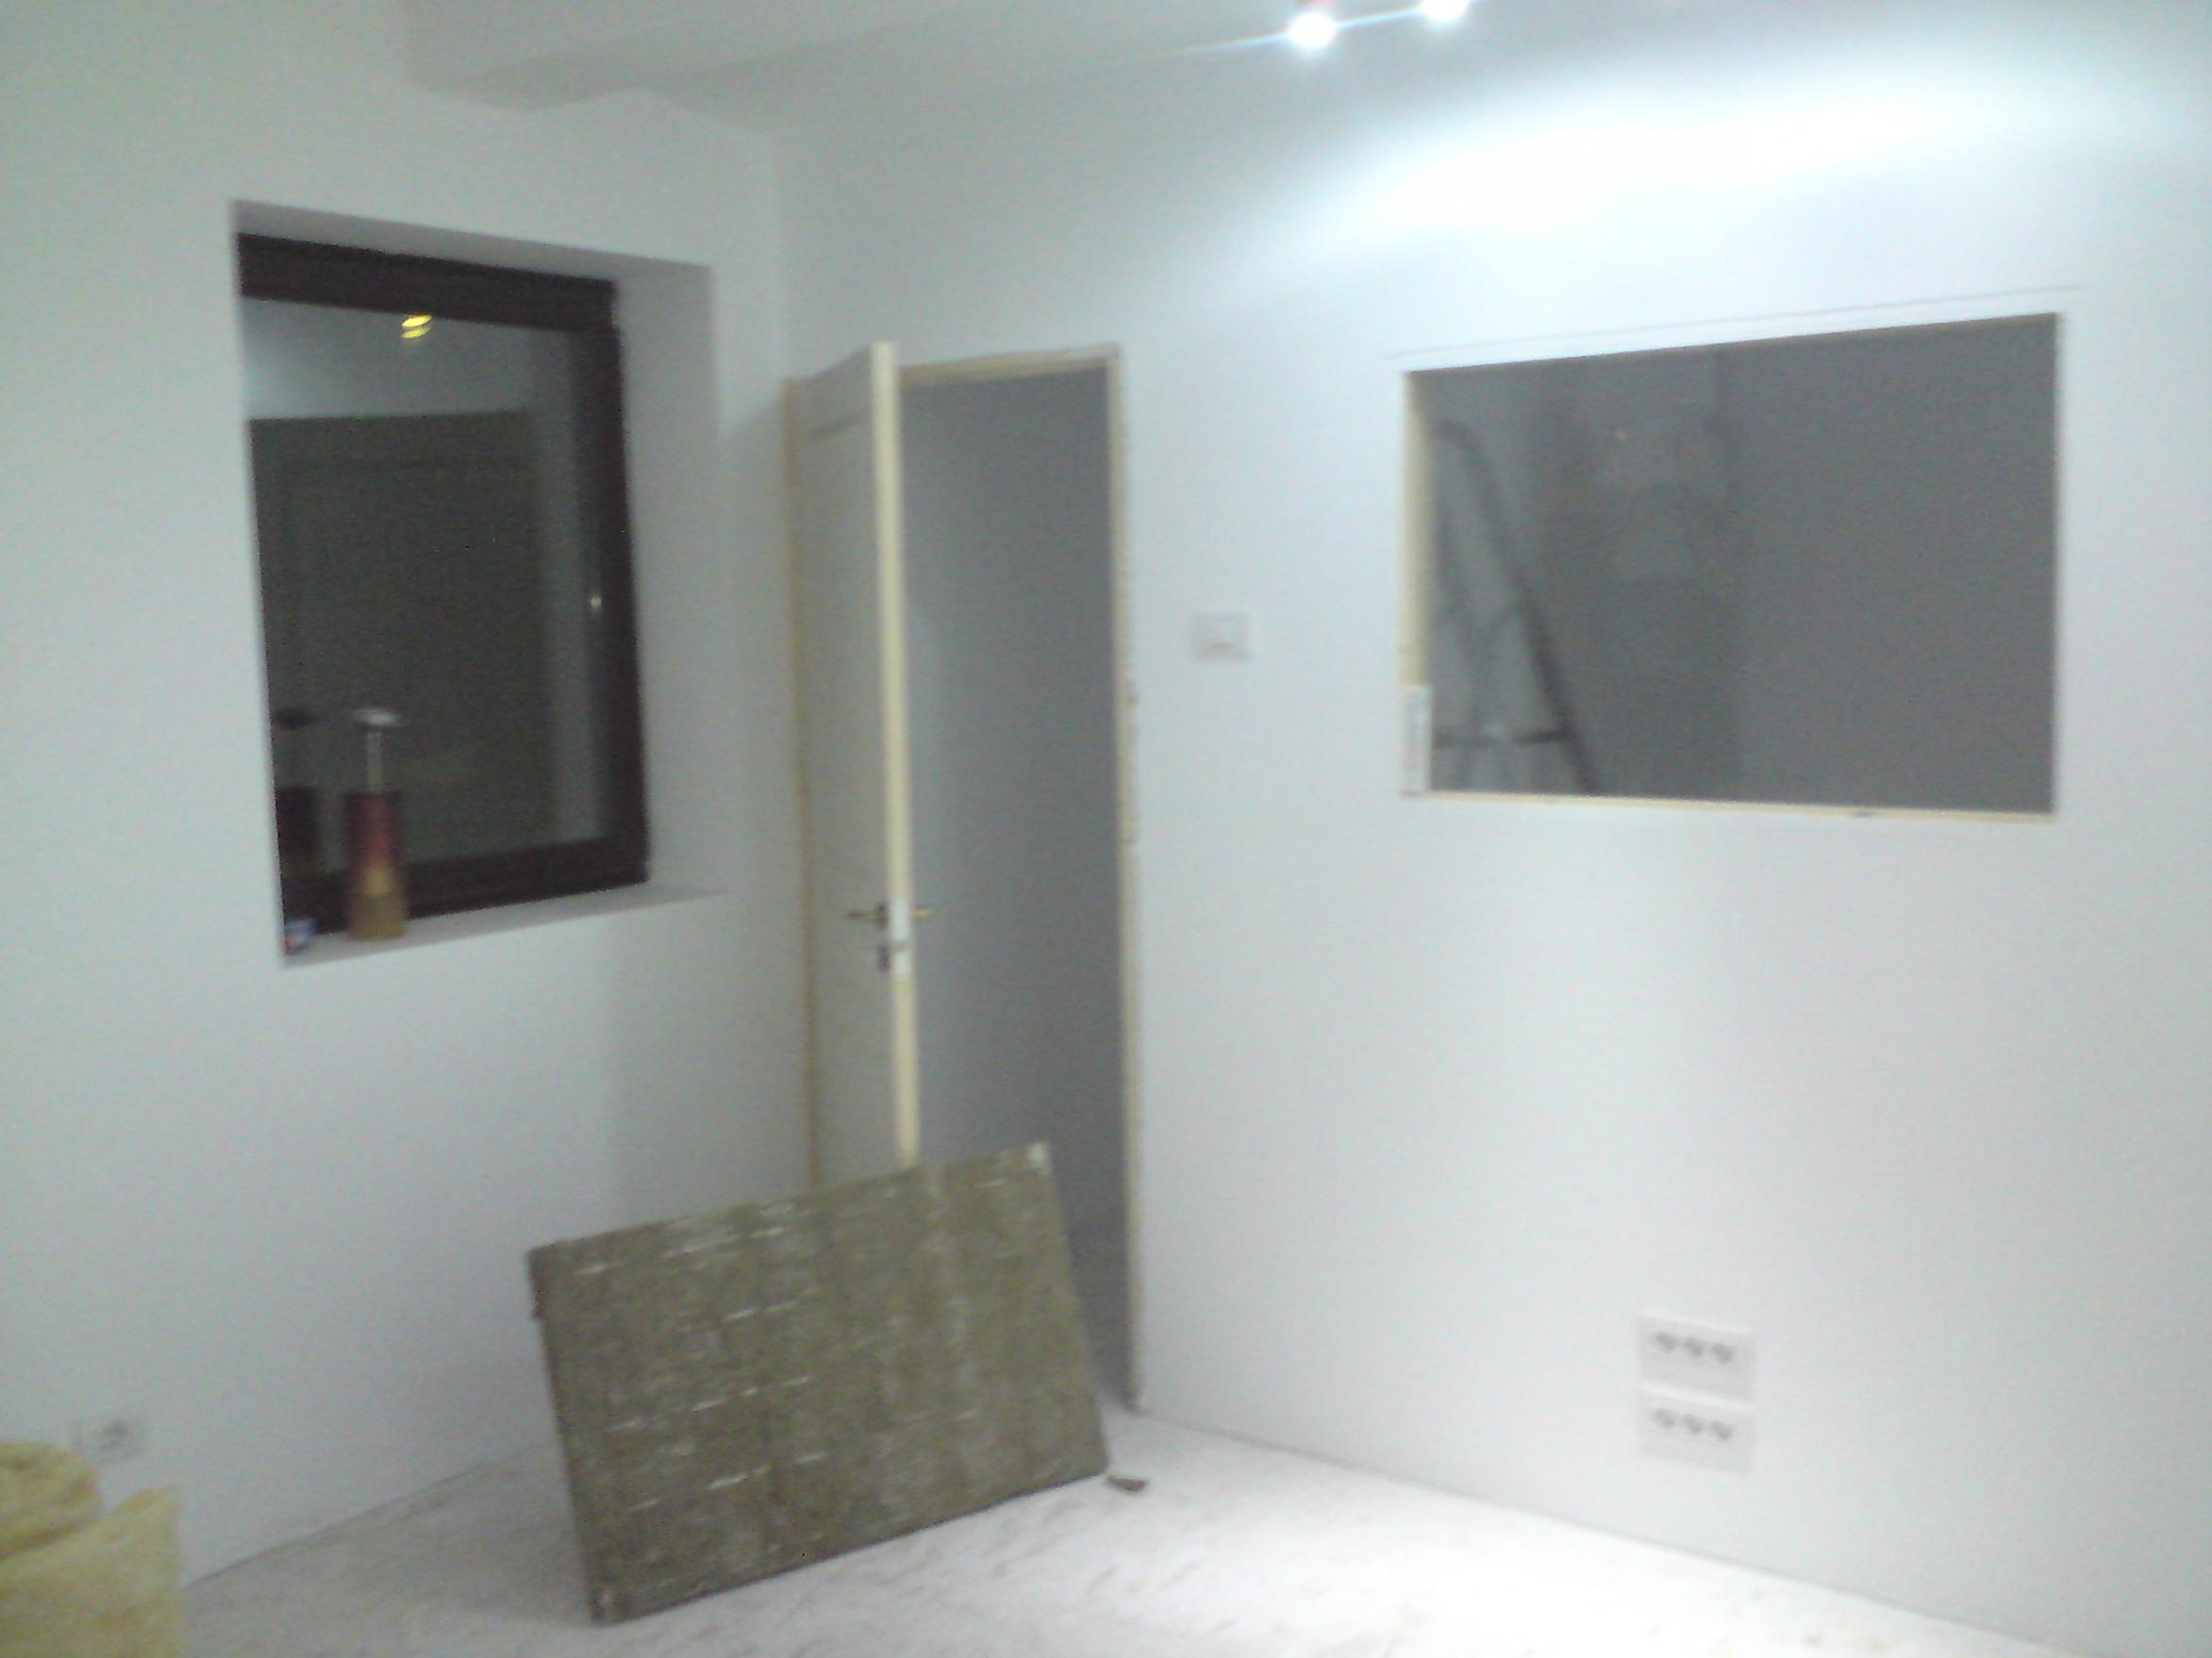 Garage studio build gearslutz pro audio community for Garage con studio